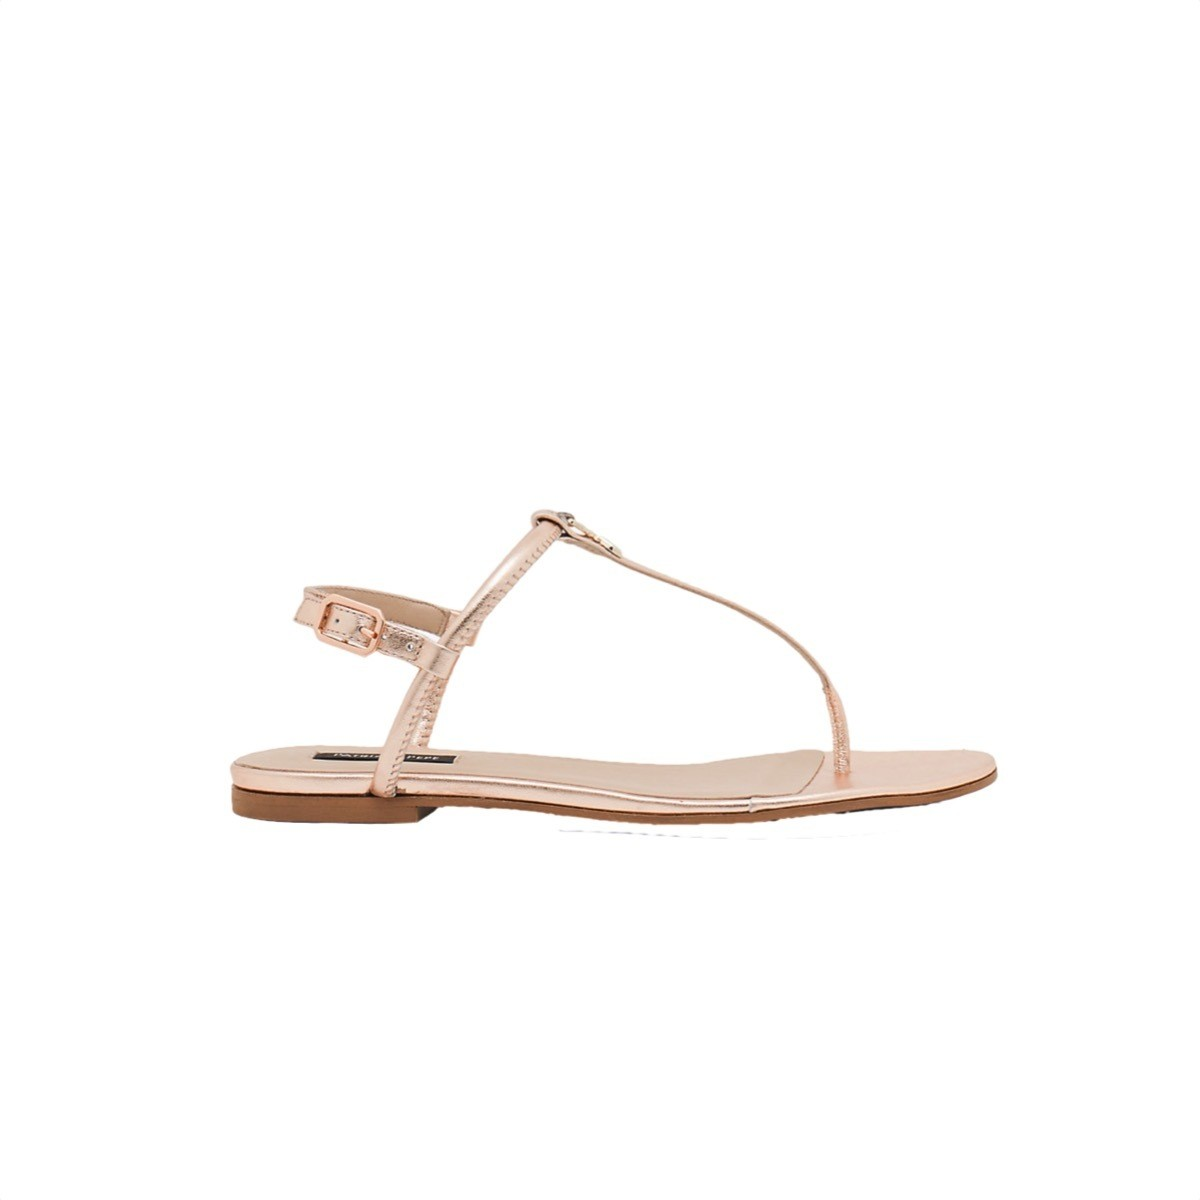 PATRIZIA PEPE - Sandalo in Pelle laminata - Oro Rosa